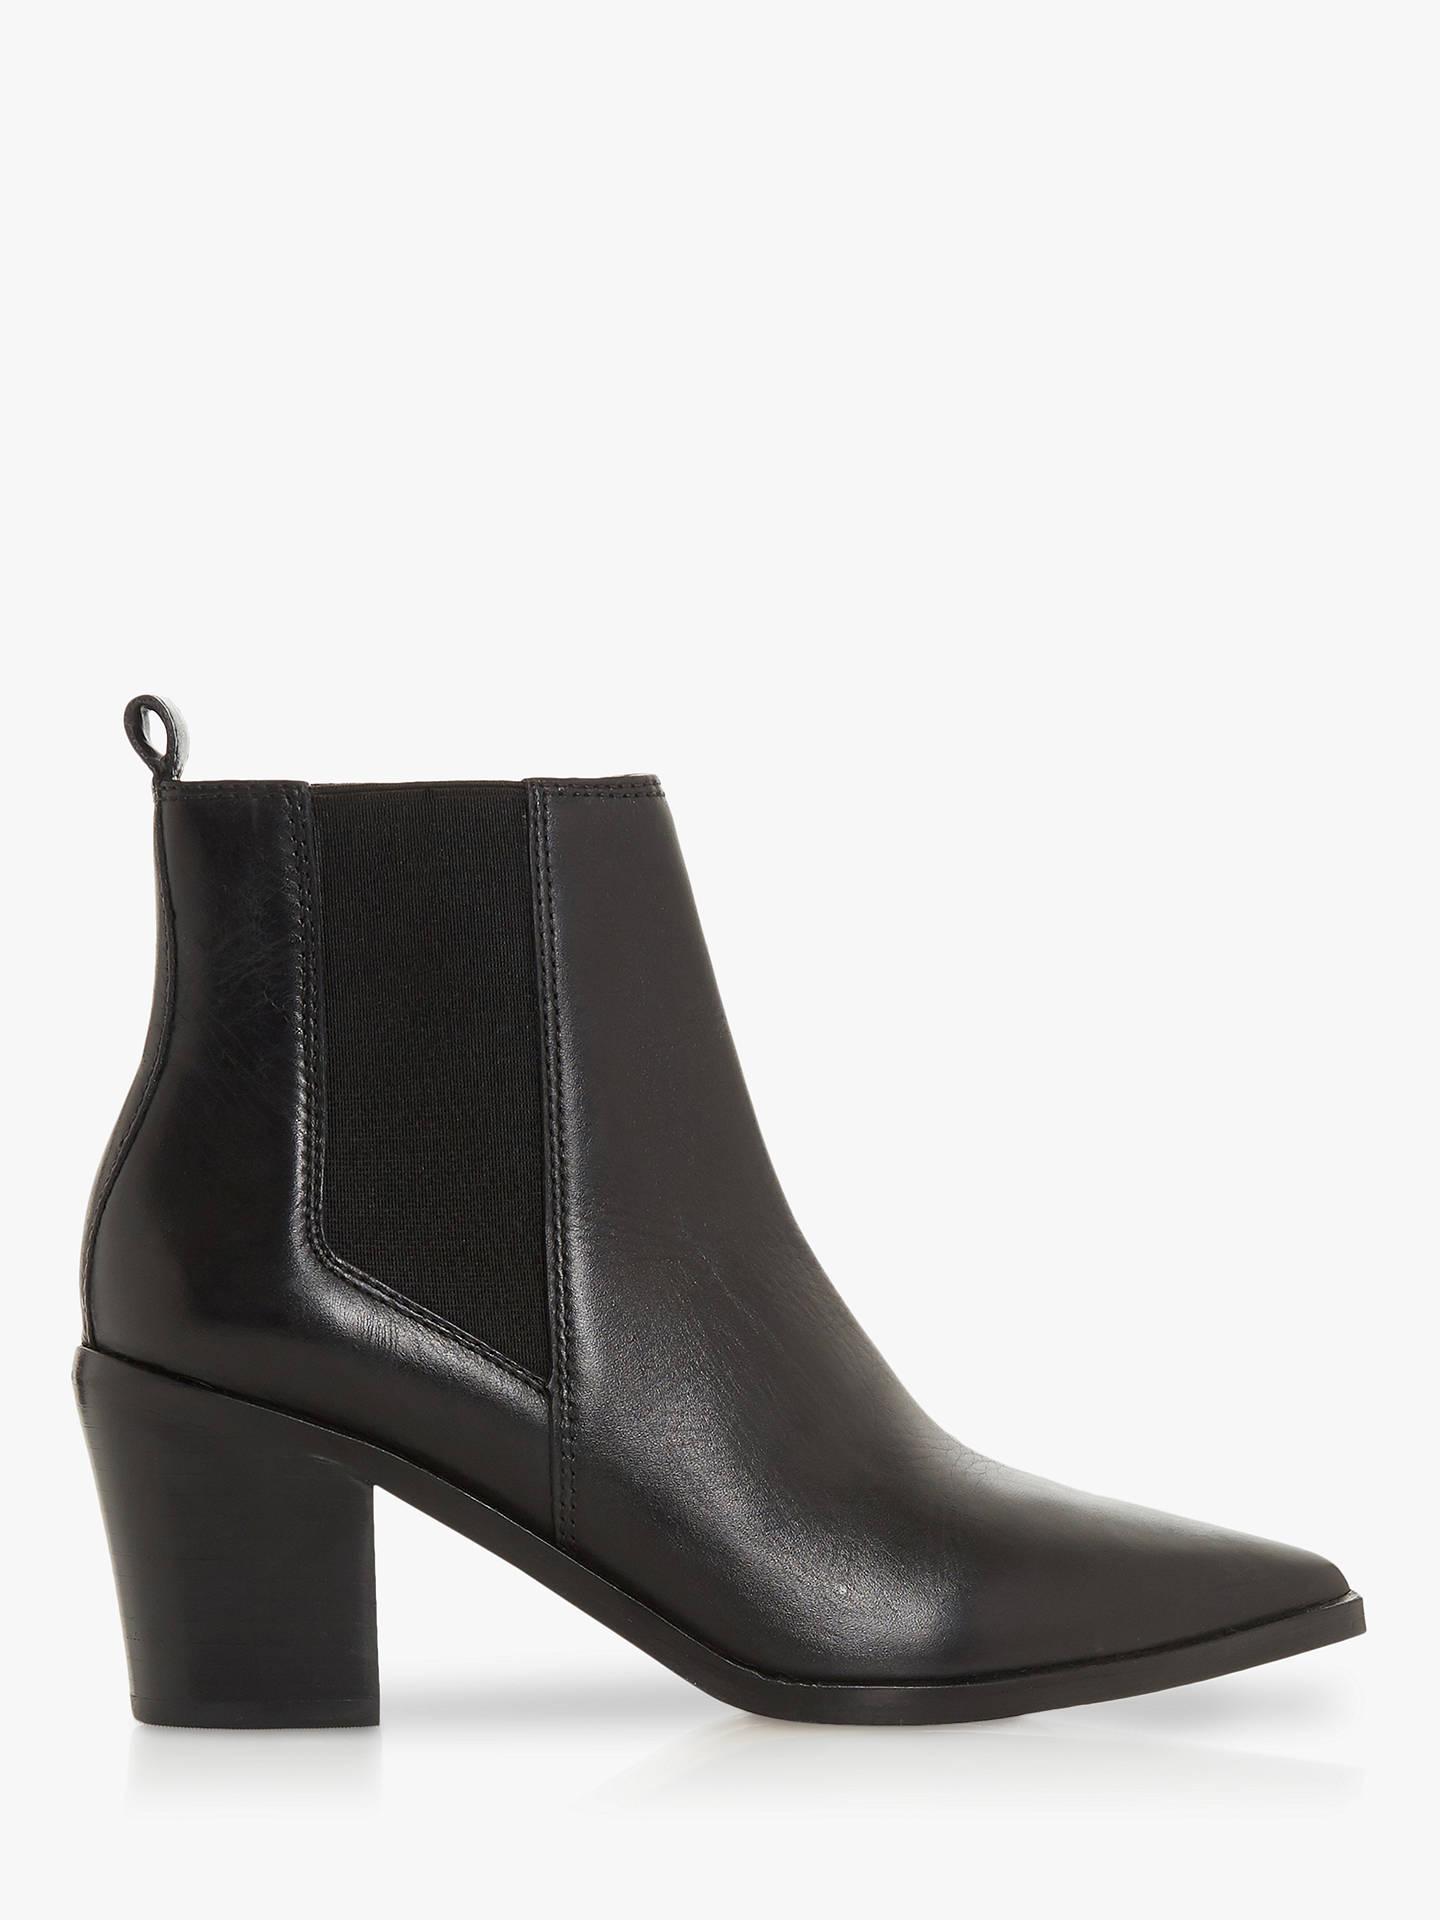 084b6559702c Dune Permit Block Heel Ankle Boots at John Lewis   Partners